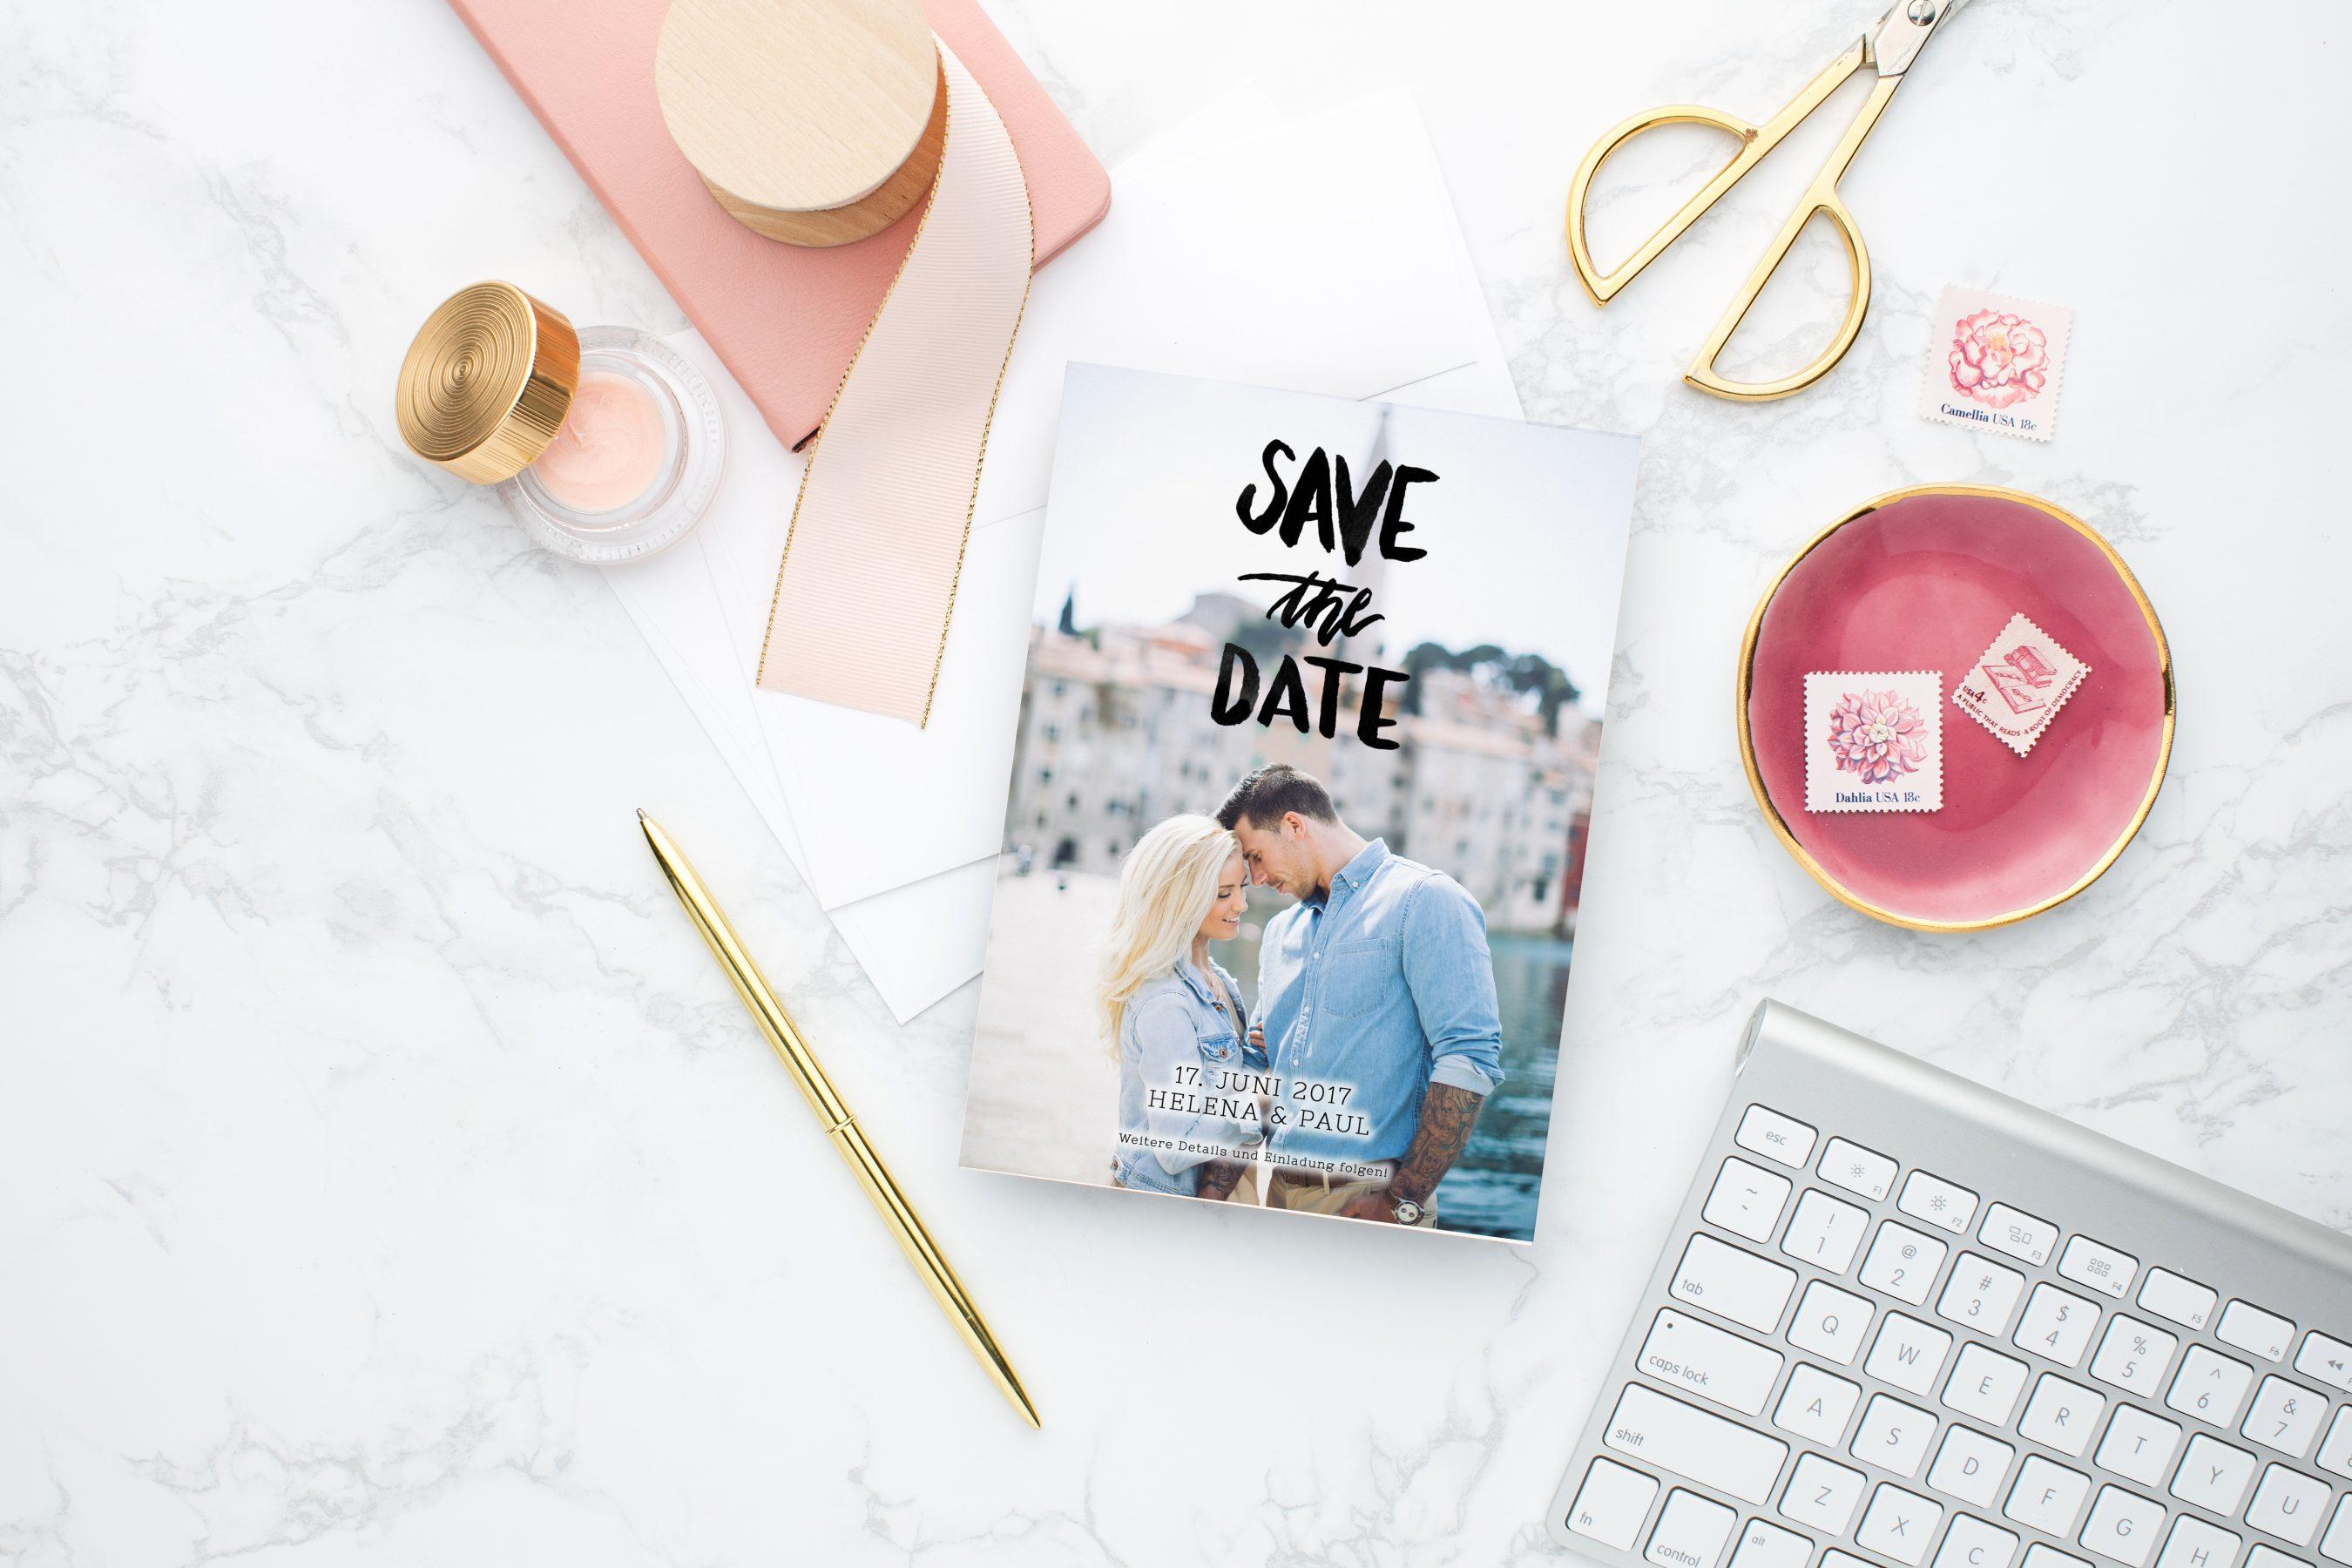 5 ideen f r individuelle save the date karten 2019 hochzeitsblog the little wedding corner. Black Bedroom Furniture Sets. Home Design Ideas